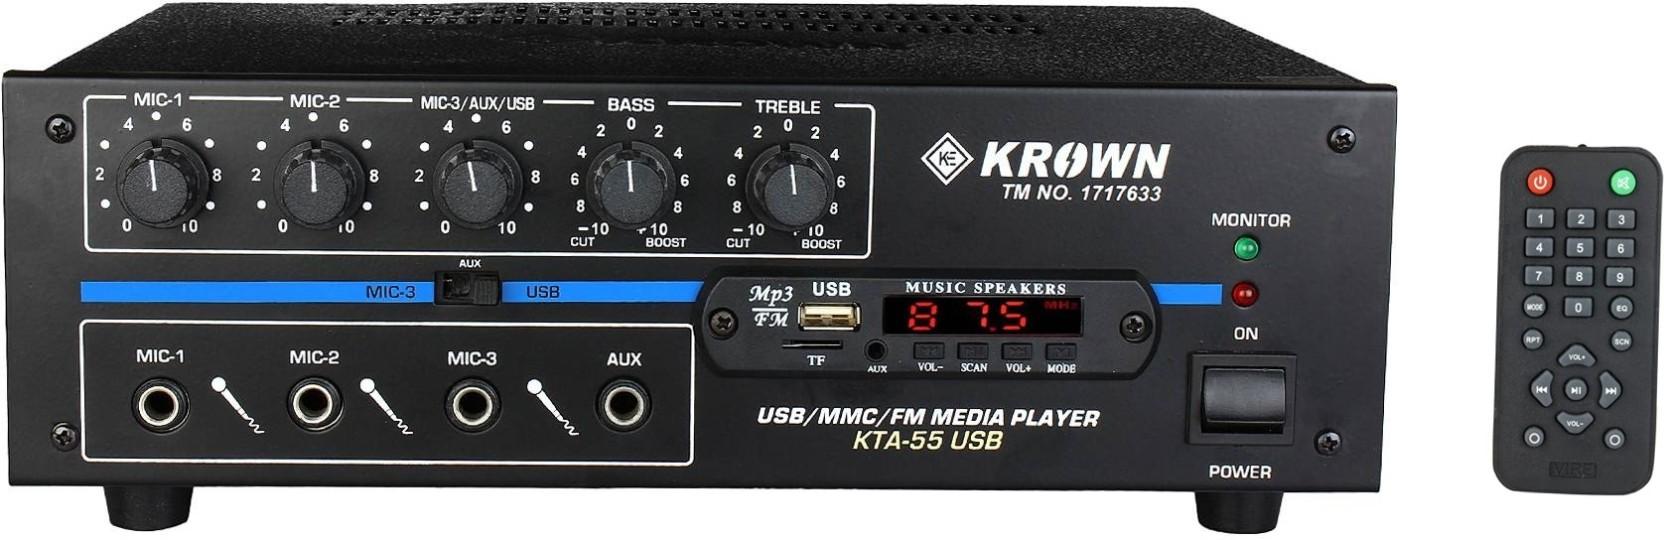 Krown Kta 550 Usb 55 W Av Power Amplifier Price In India Buy 58 Audio Home